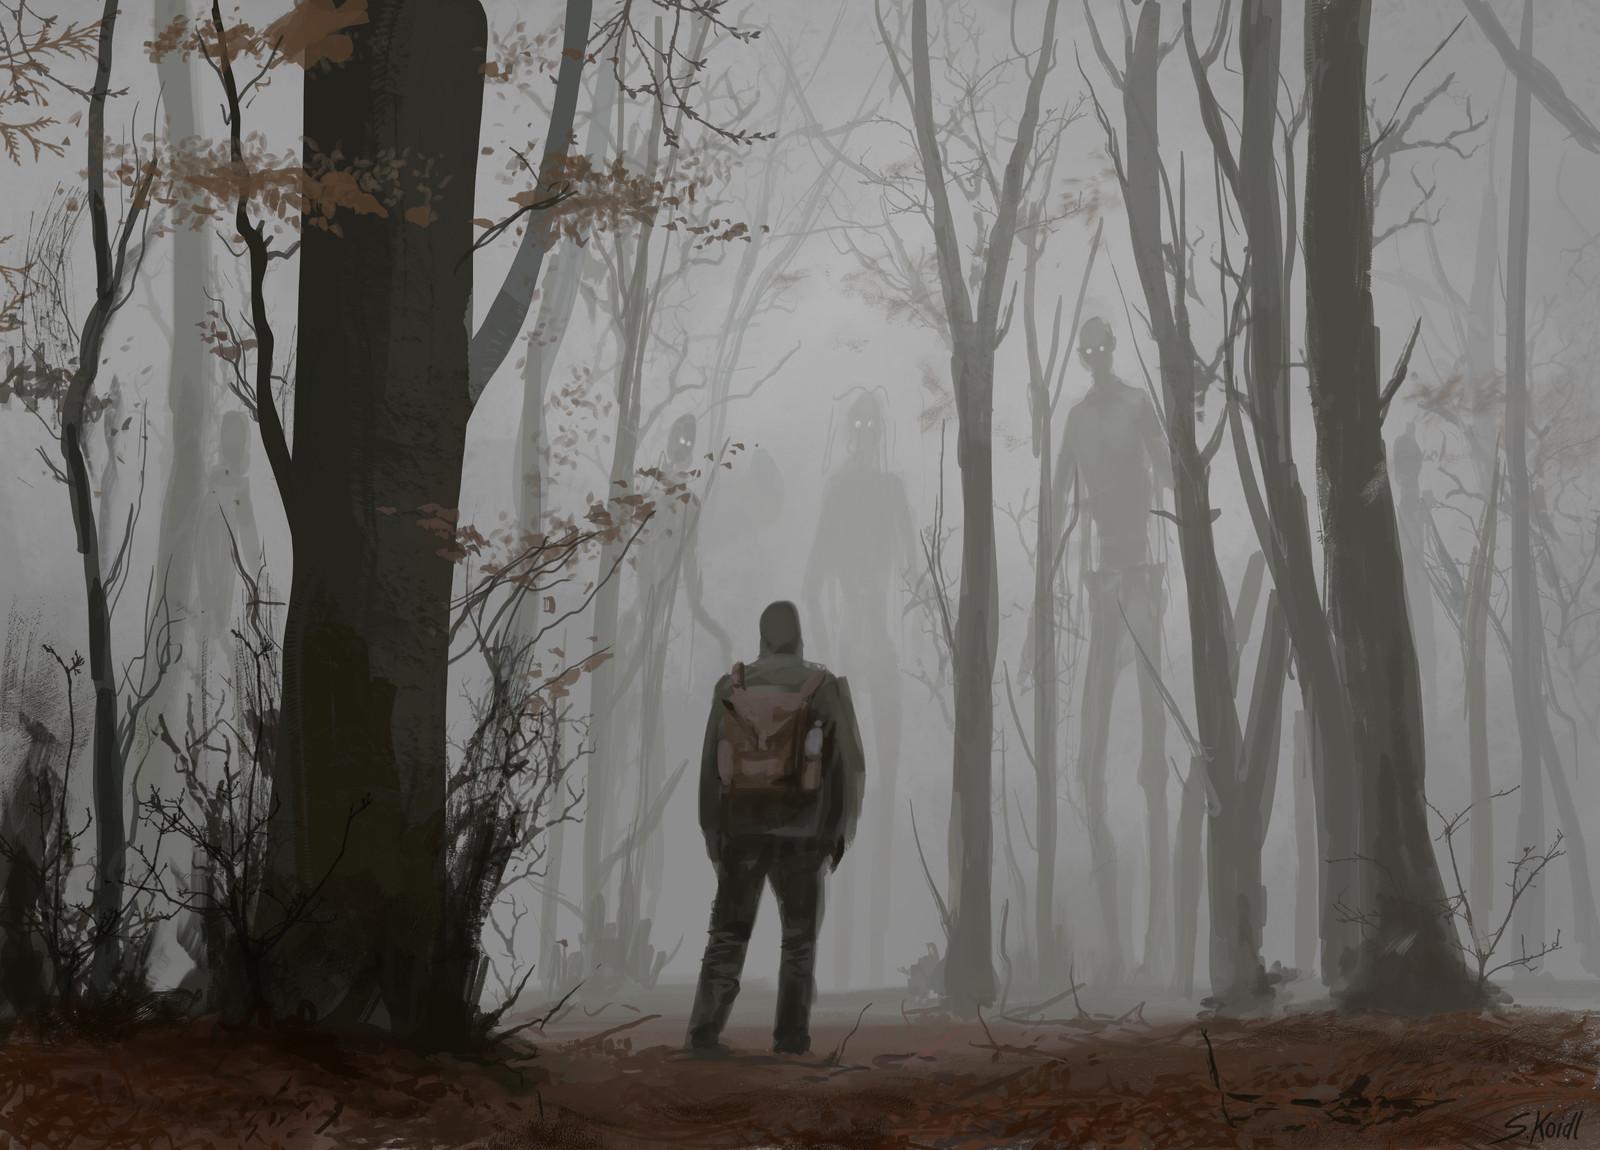 Silent watchers